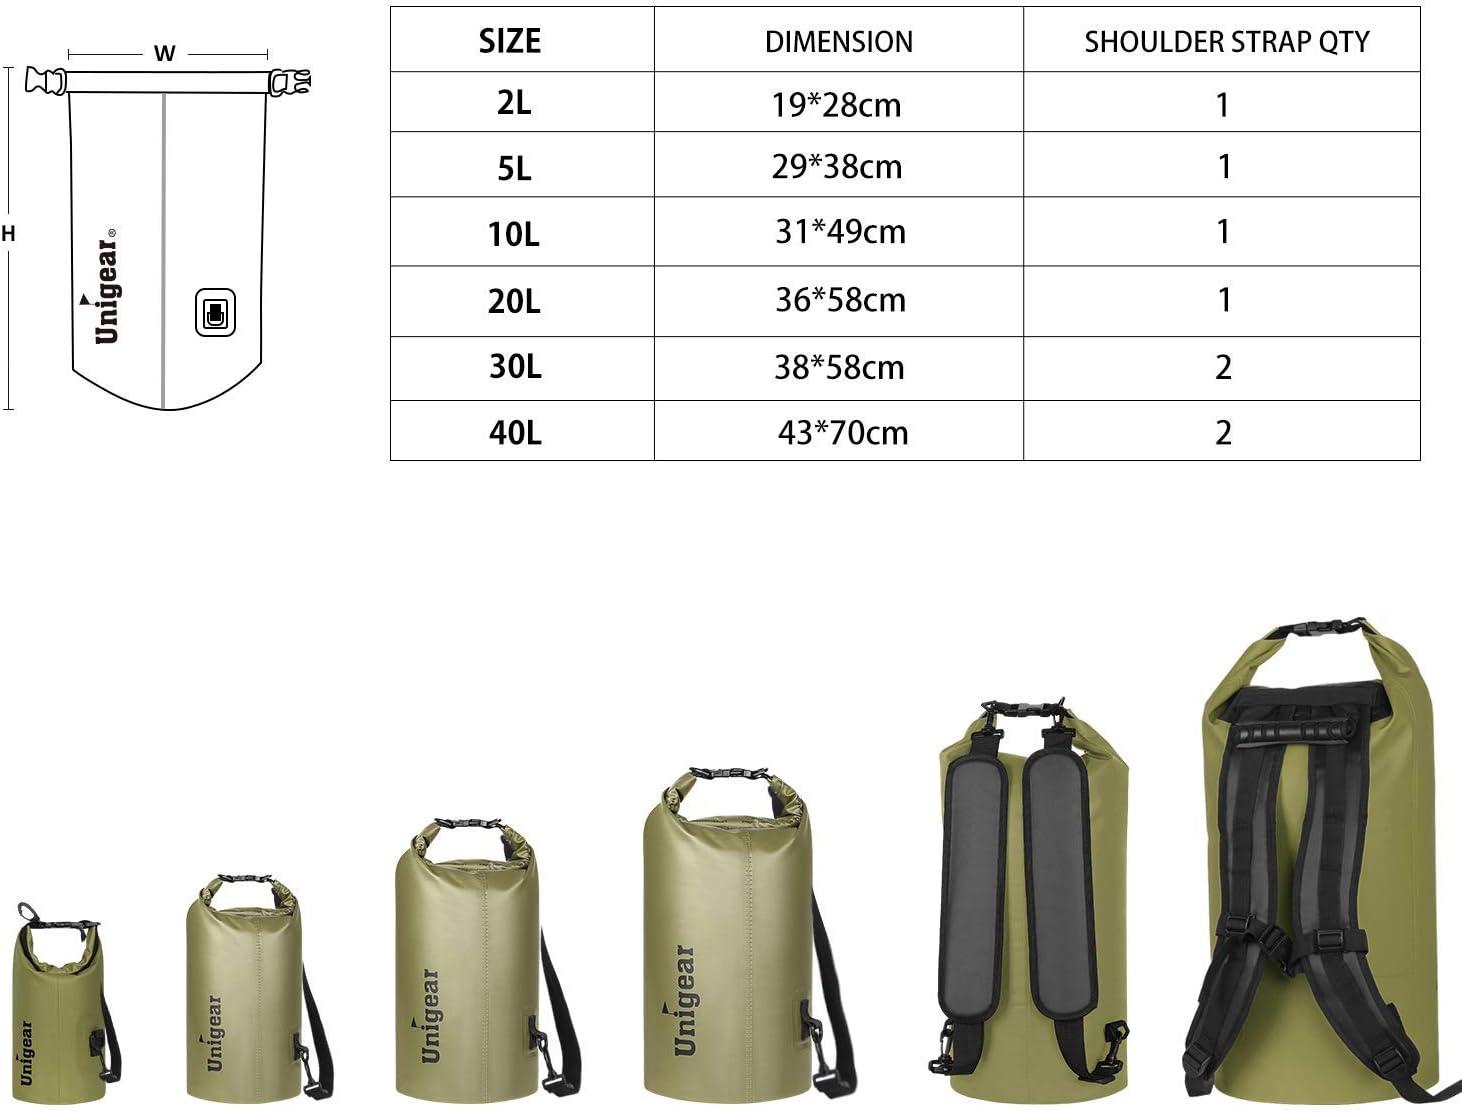 Funda De Mov/íl Camping Playa Unigear Bolsa Estanca 2L~40L Seca Impermeable